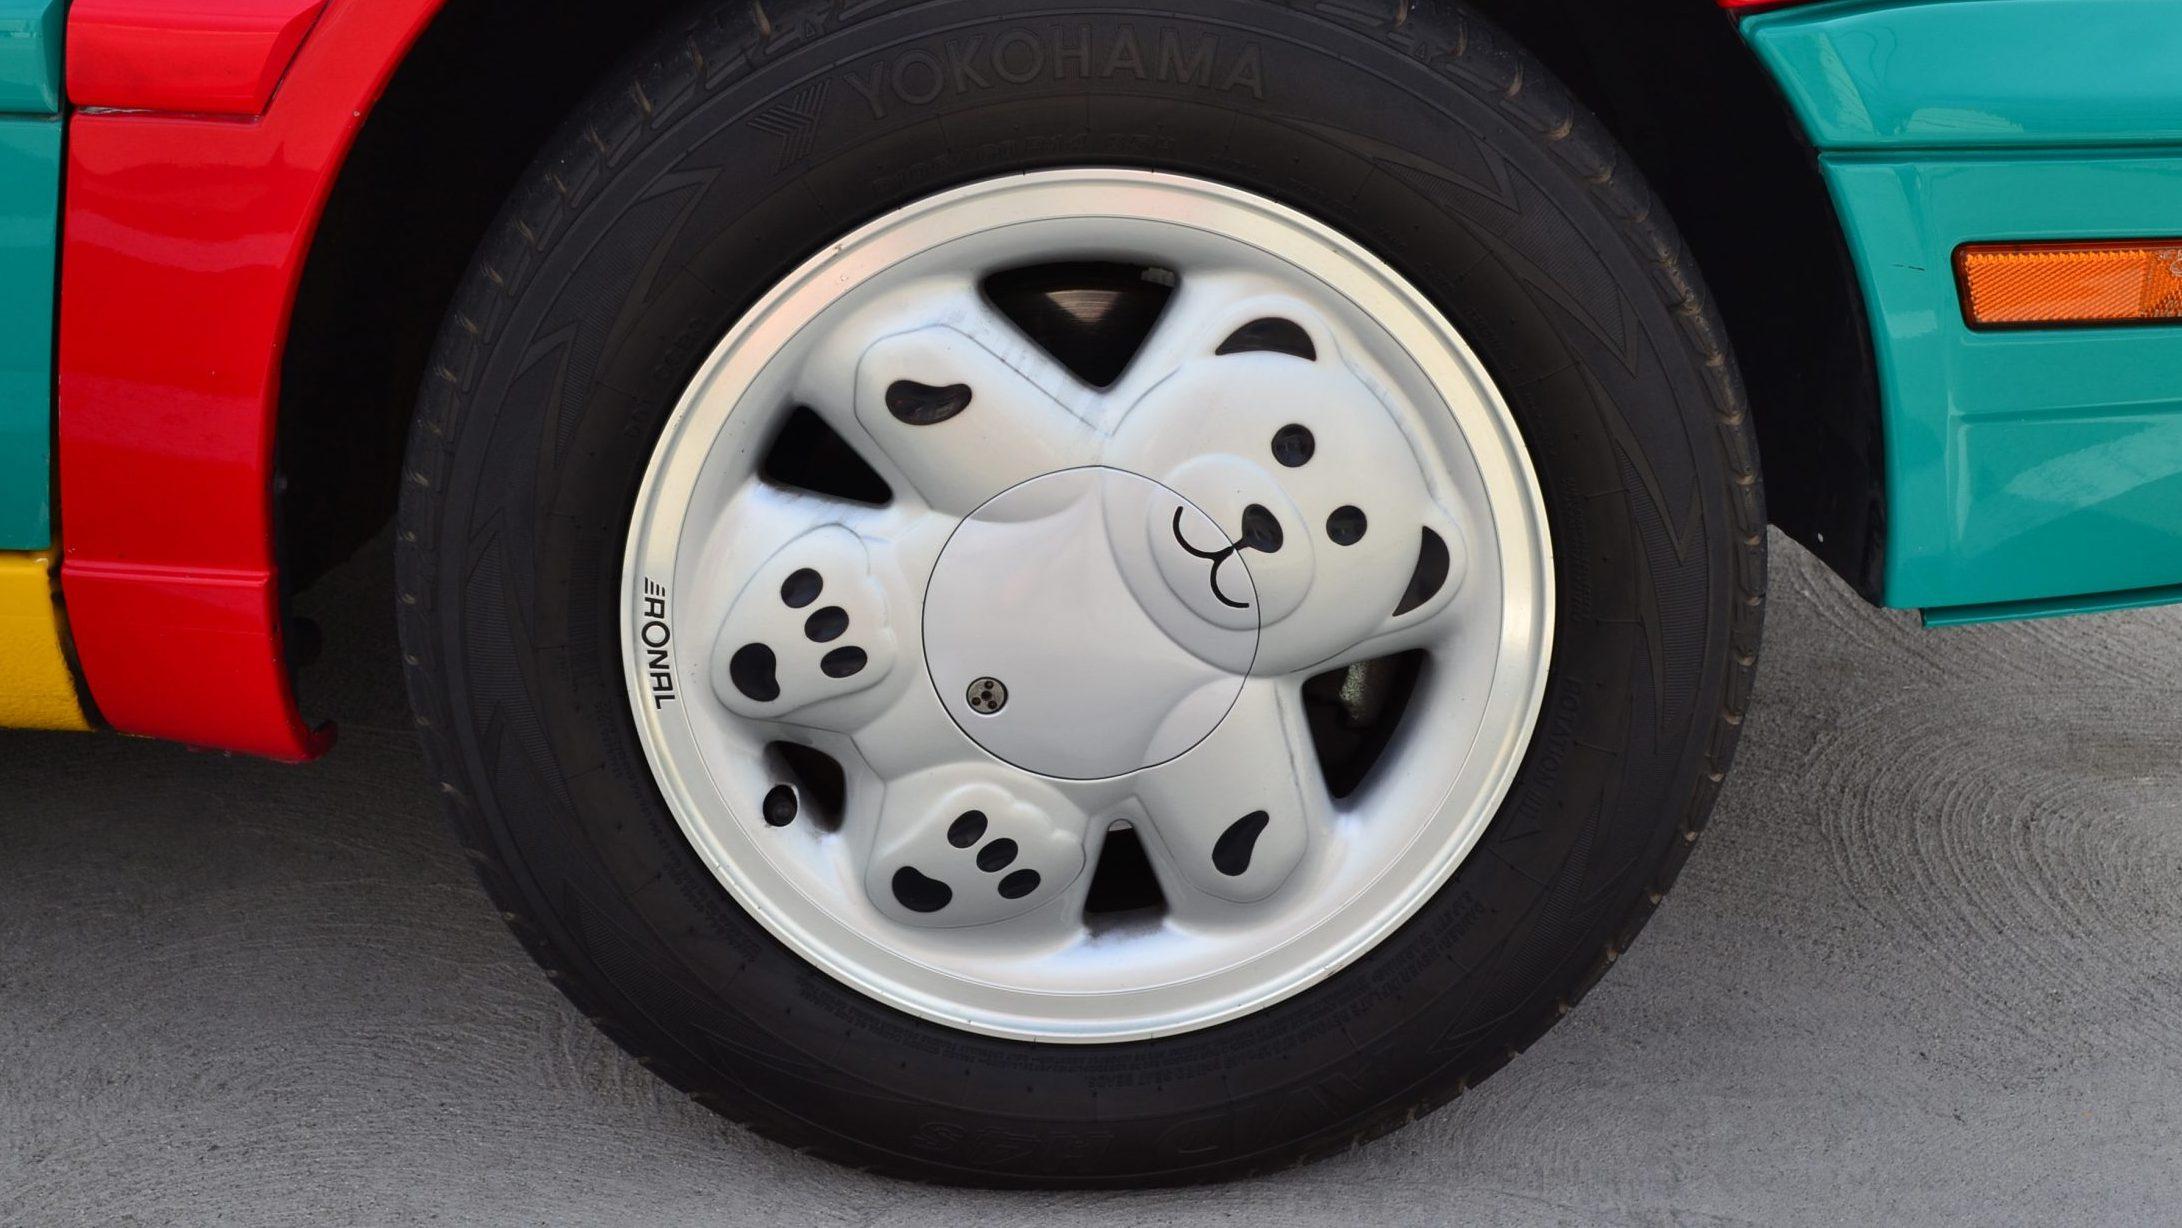 Ronal Teddy onder VW Golf III Harlequin